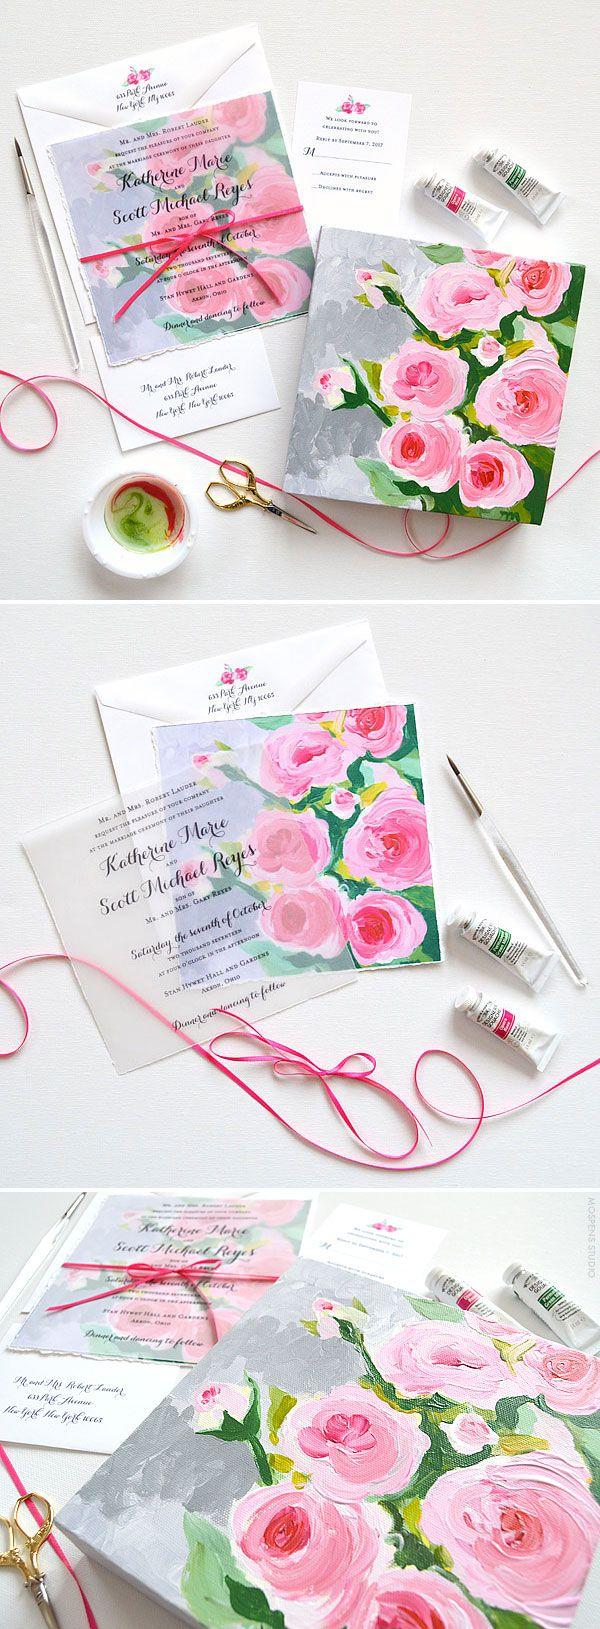 Custom Save the Dates, Unique Wedding Invitations & Personalized ...